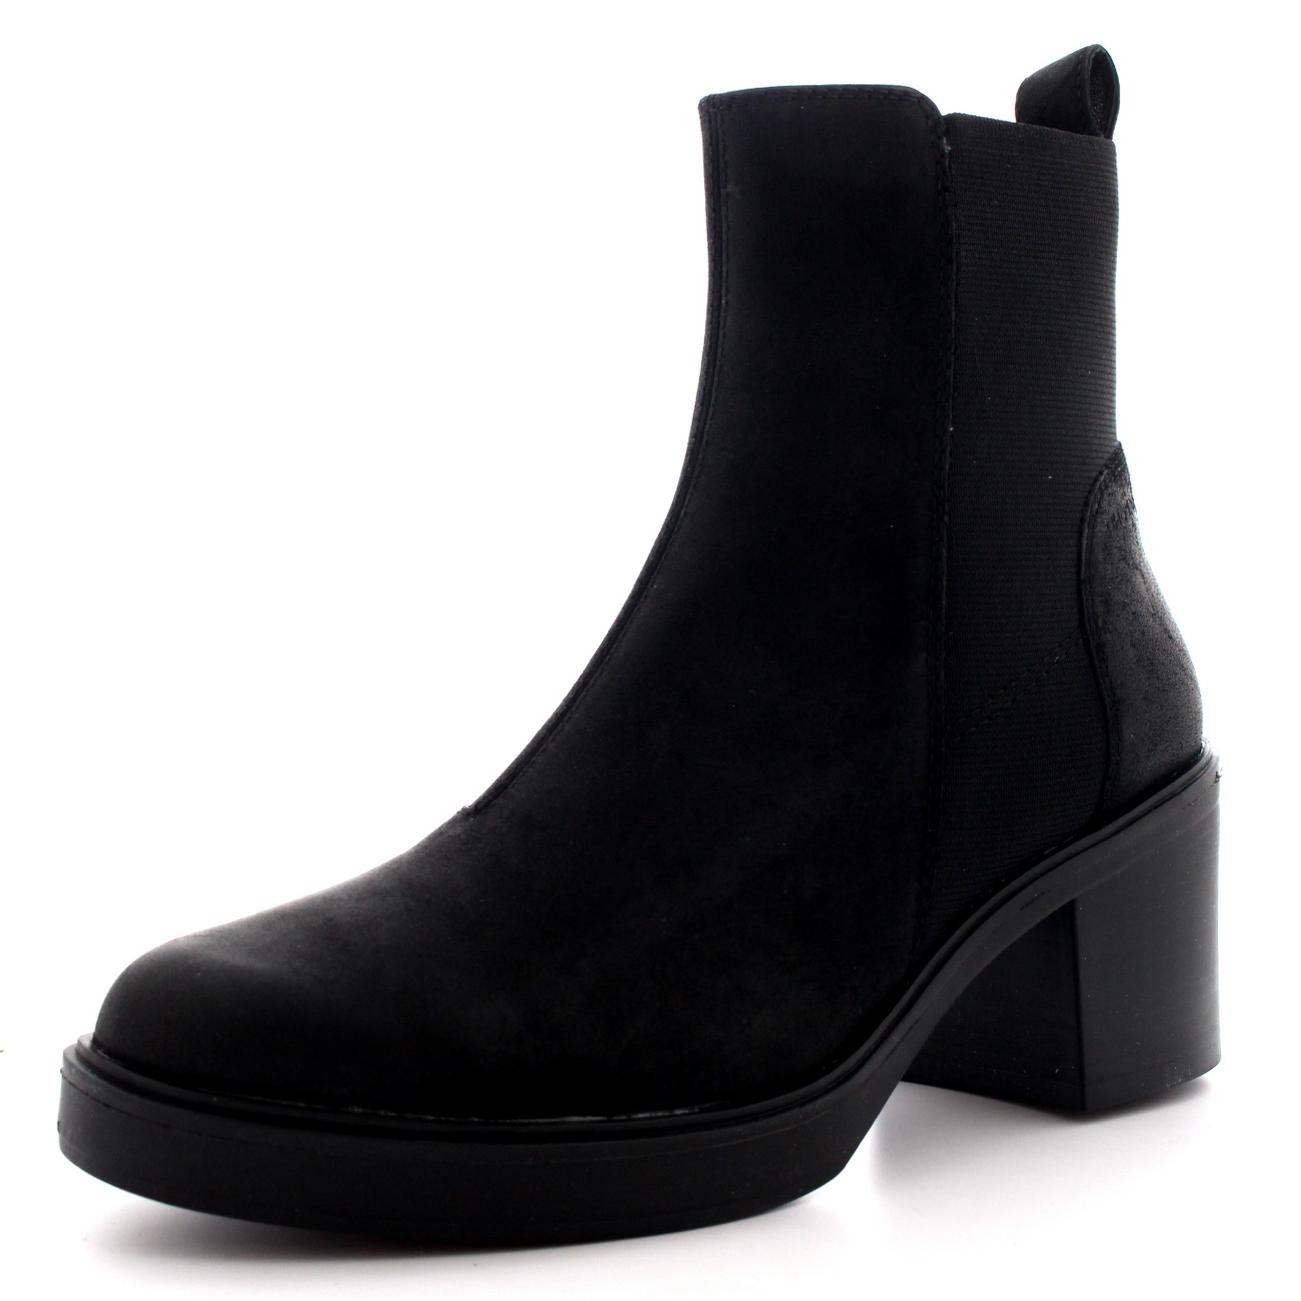 Vagabond Tilda Ankle Boot